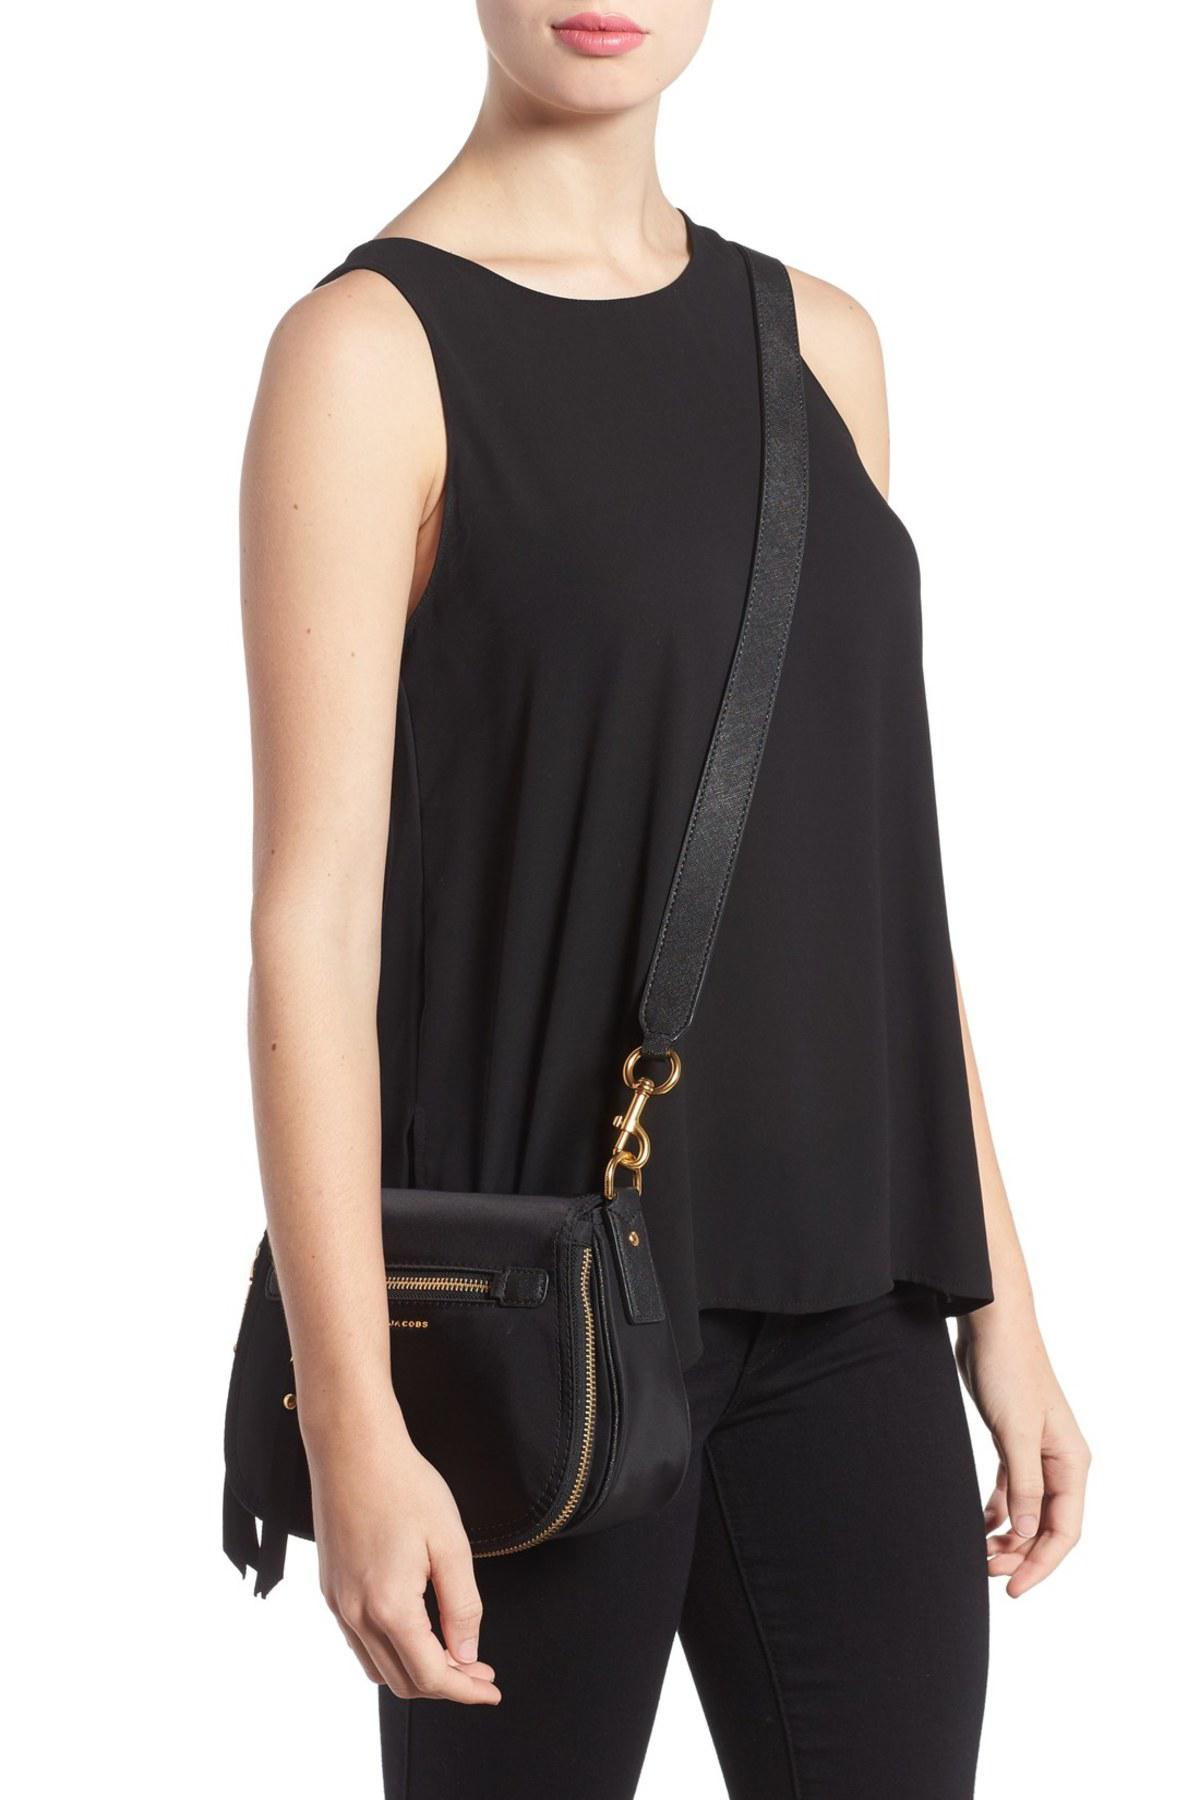 527ecbb08c95 Lyst - Marc Jacobs Trooper - Small Nomad Nylon Crossbody Bag in Black